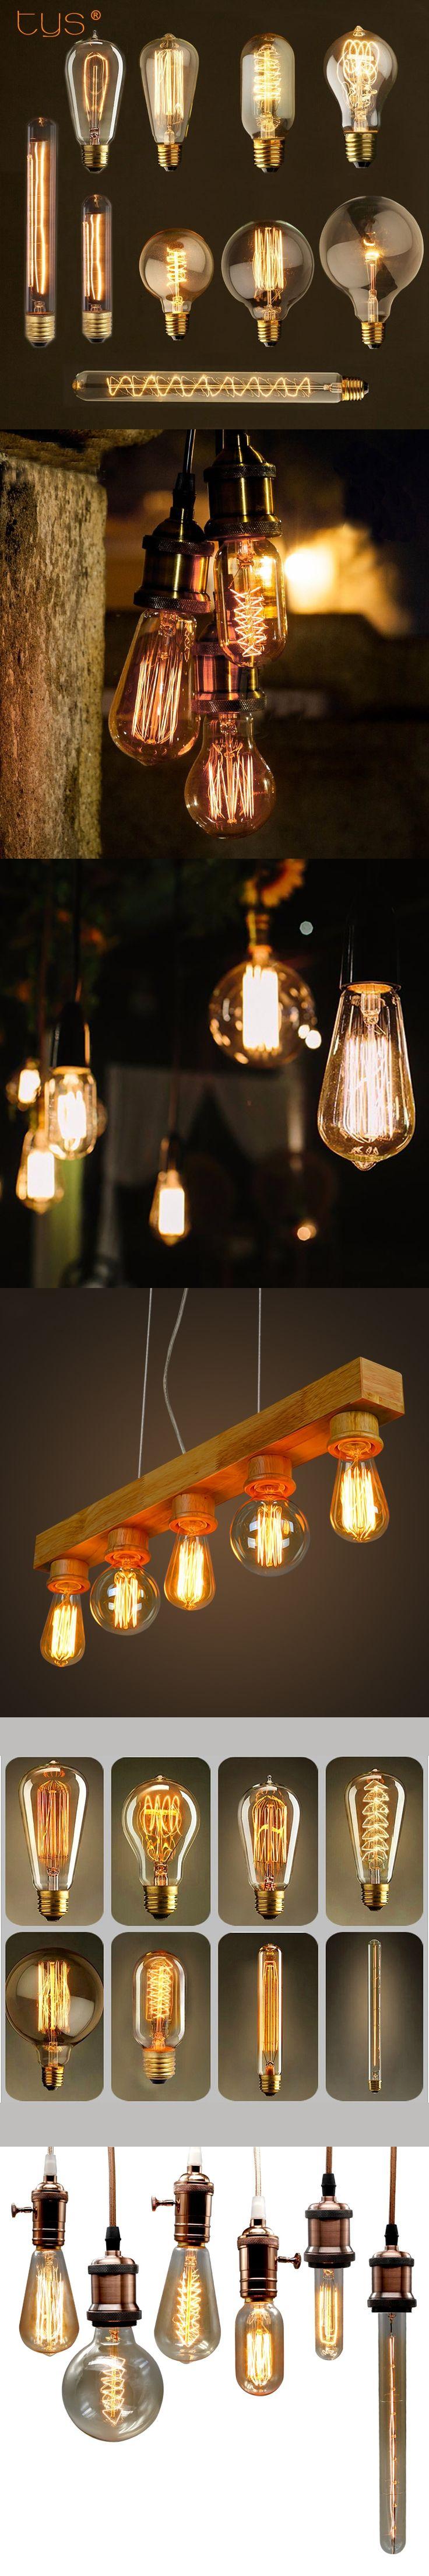 Edison Bulb E27 220v Incandescent Lamp 40W Vintage Lamp Pendant Light Retro Lighting Ceiling lampadas Filament Bulb Edison Lamp